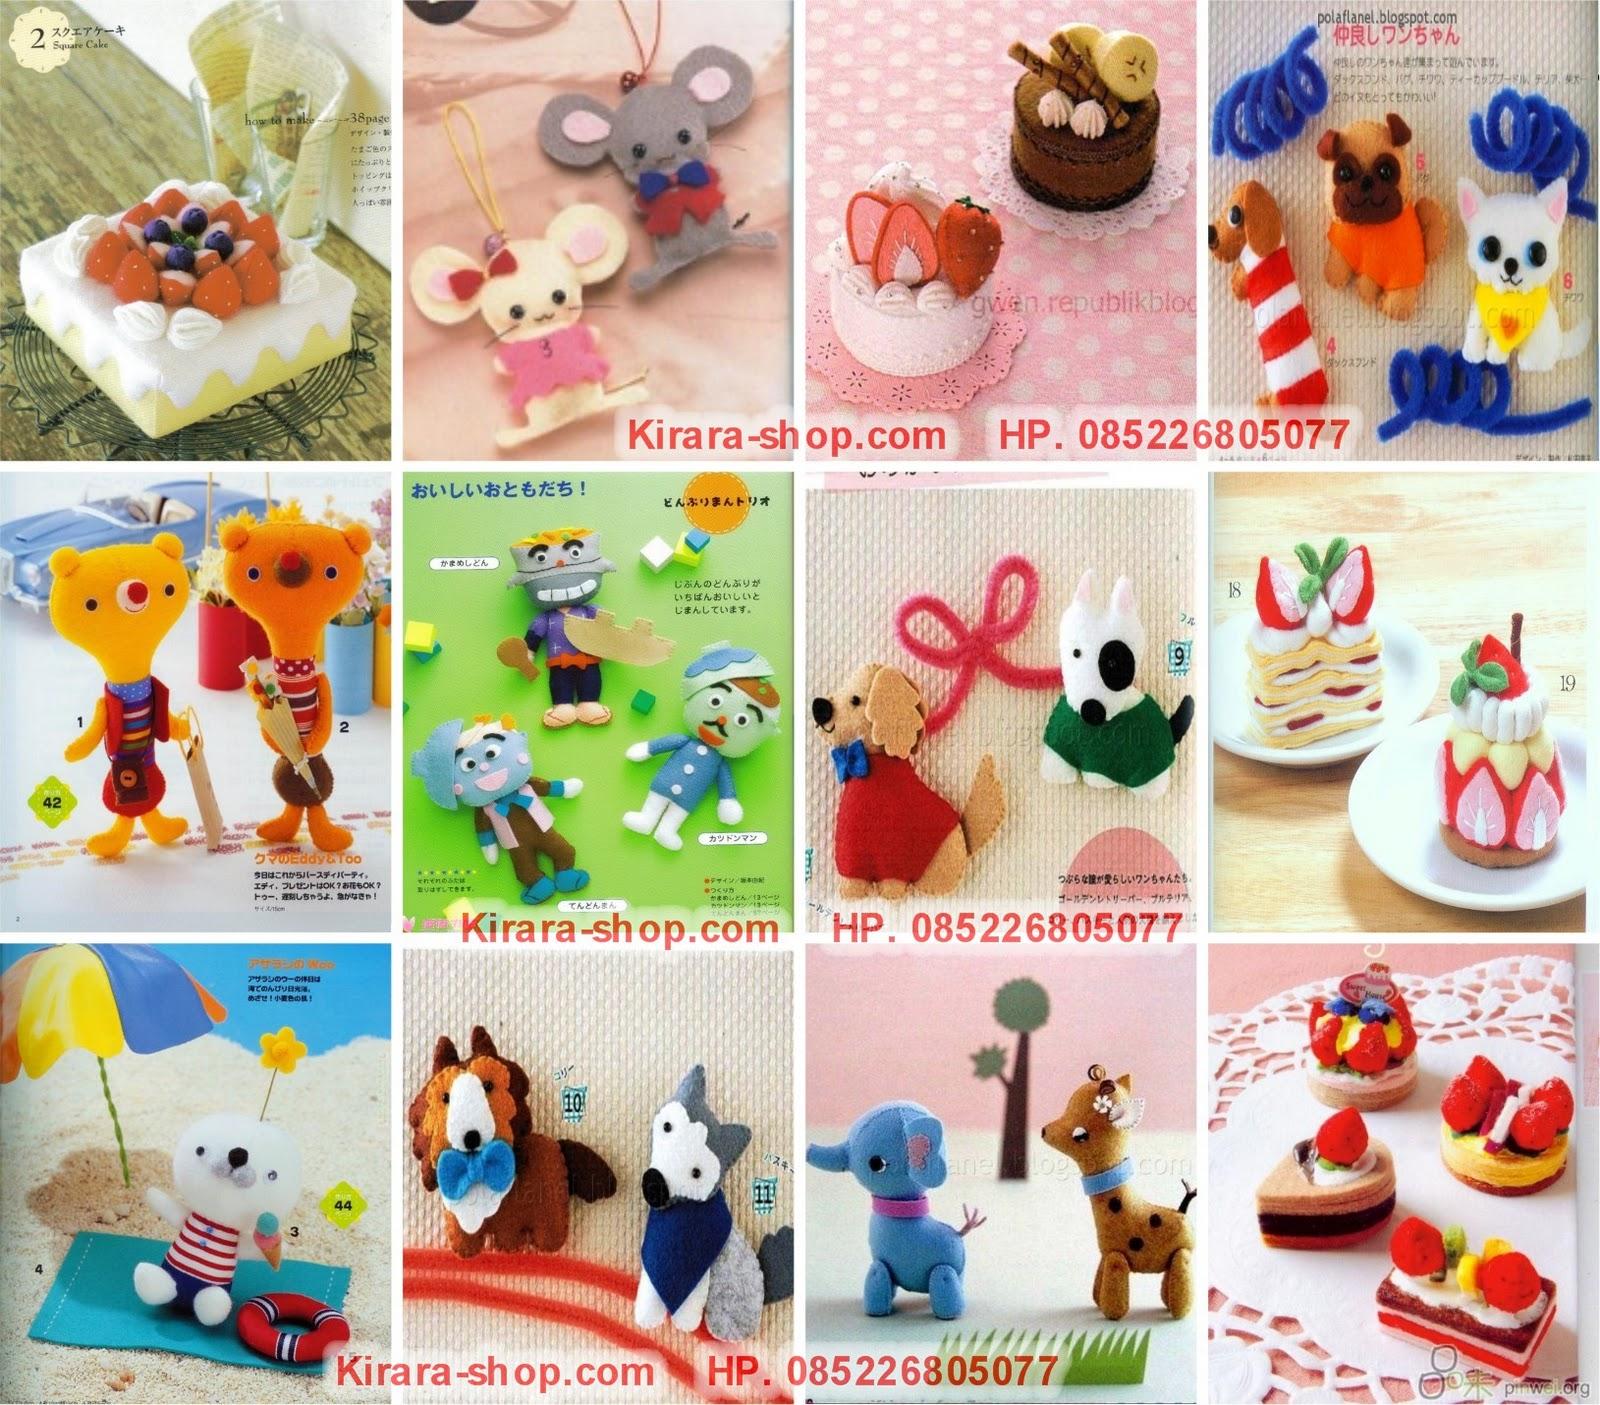 flanel+toys%2C+cake+fflanel%2C+flanel%2C+kerajinan+kain+flanel%2C